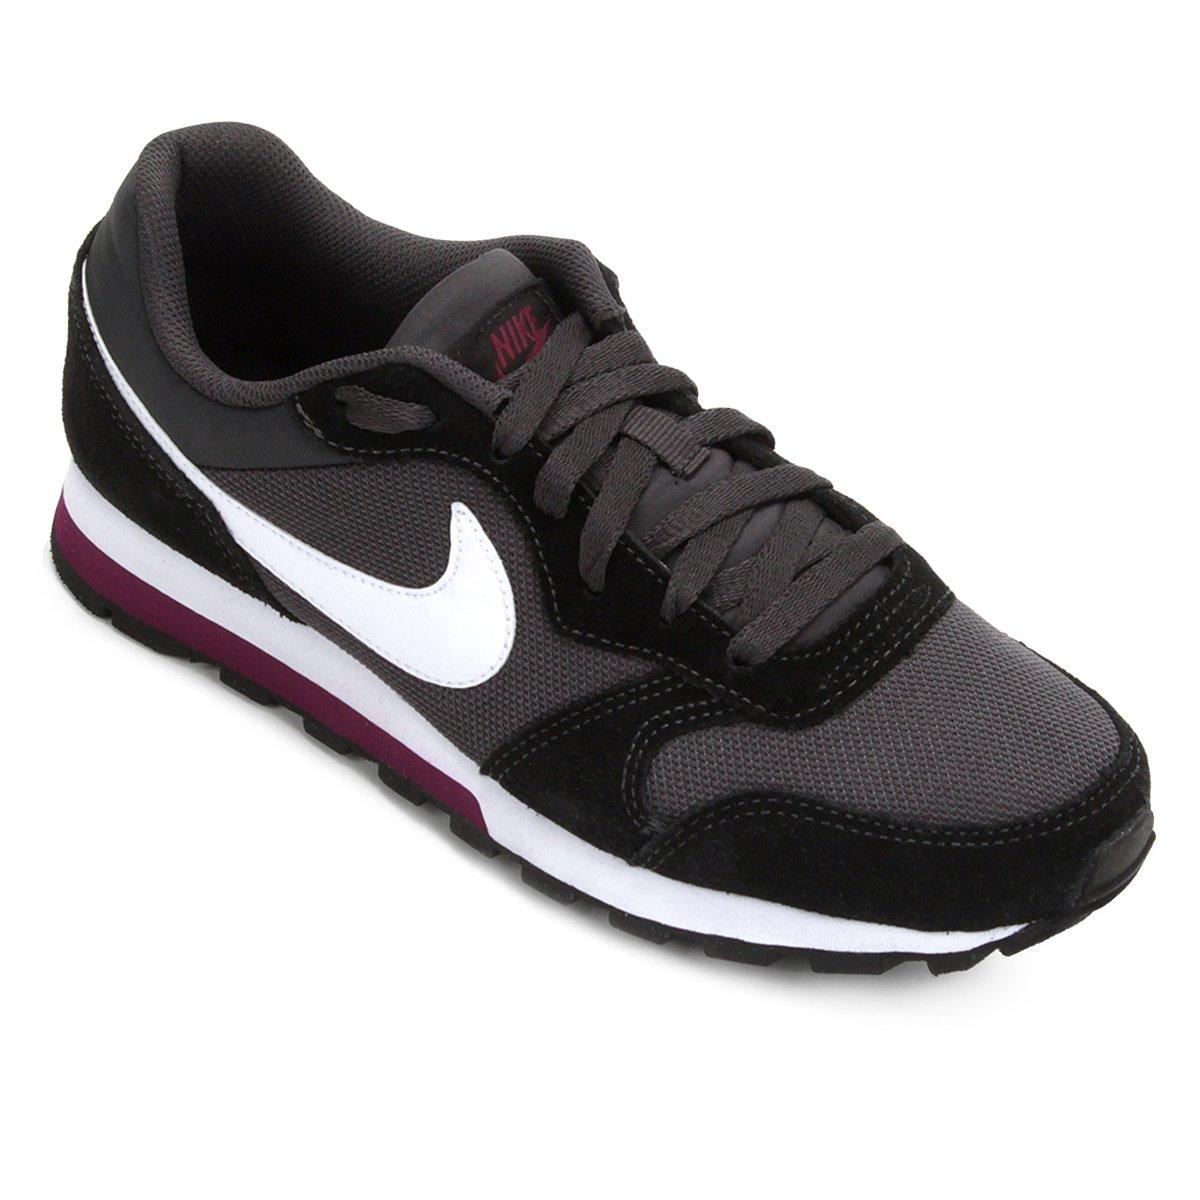 b19412c21f13c Tênis Nike Md Runner 2 Feminino - Branco e Grafite | Shop Timão